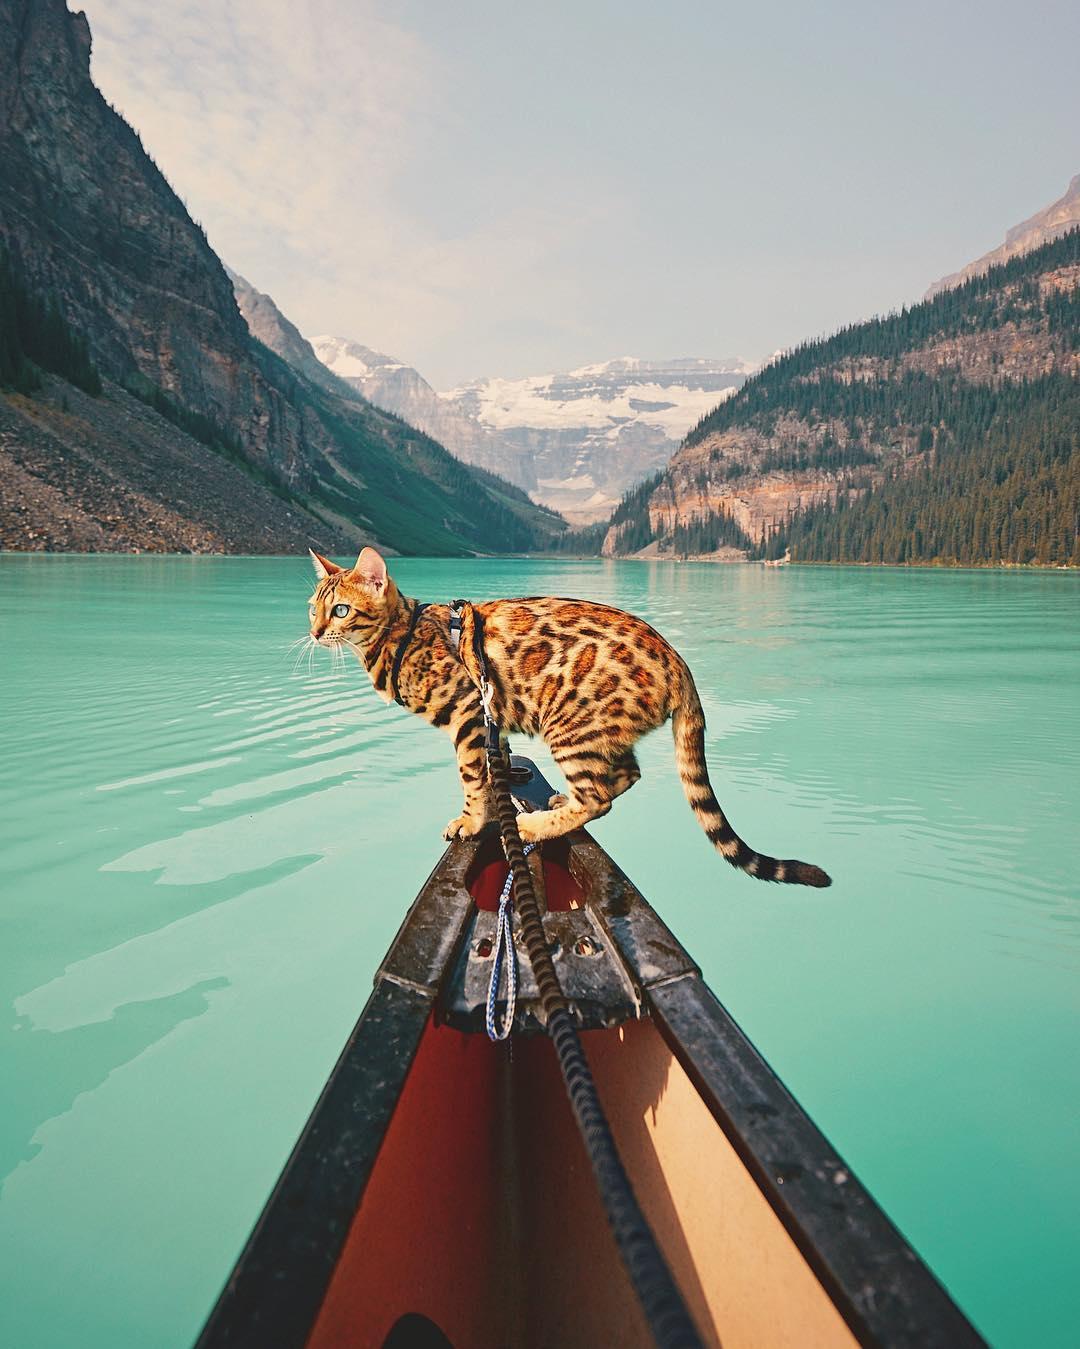 عکس گربه بنگال , طبیعت کانادا